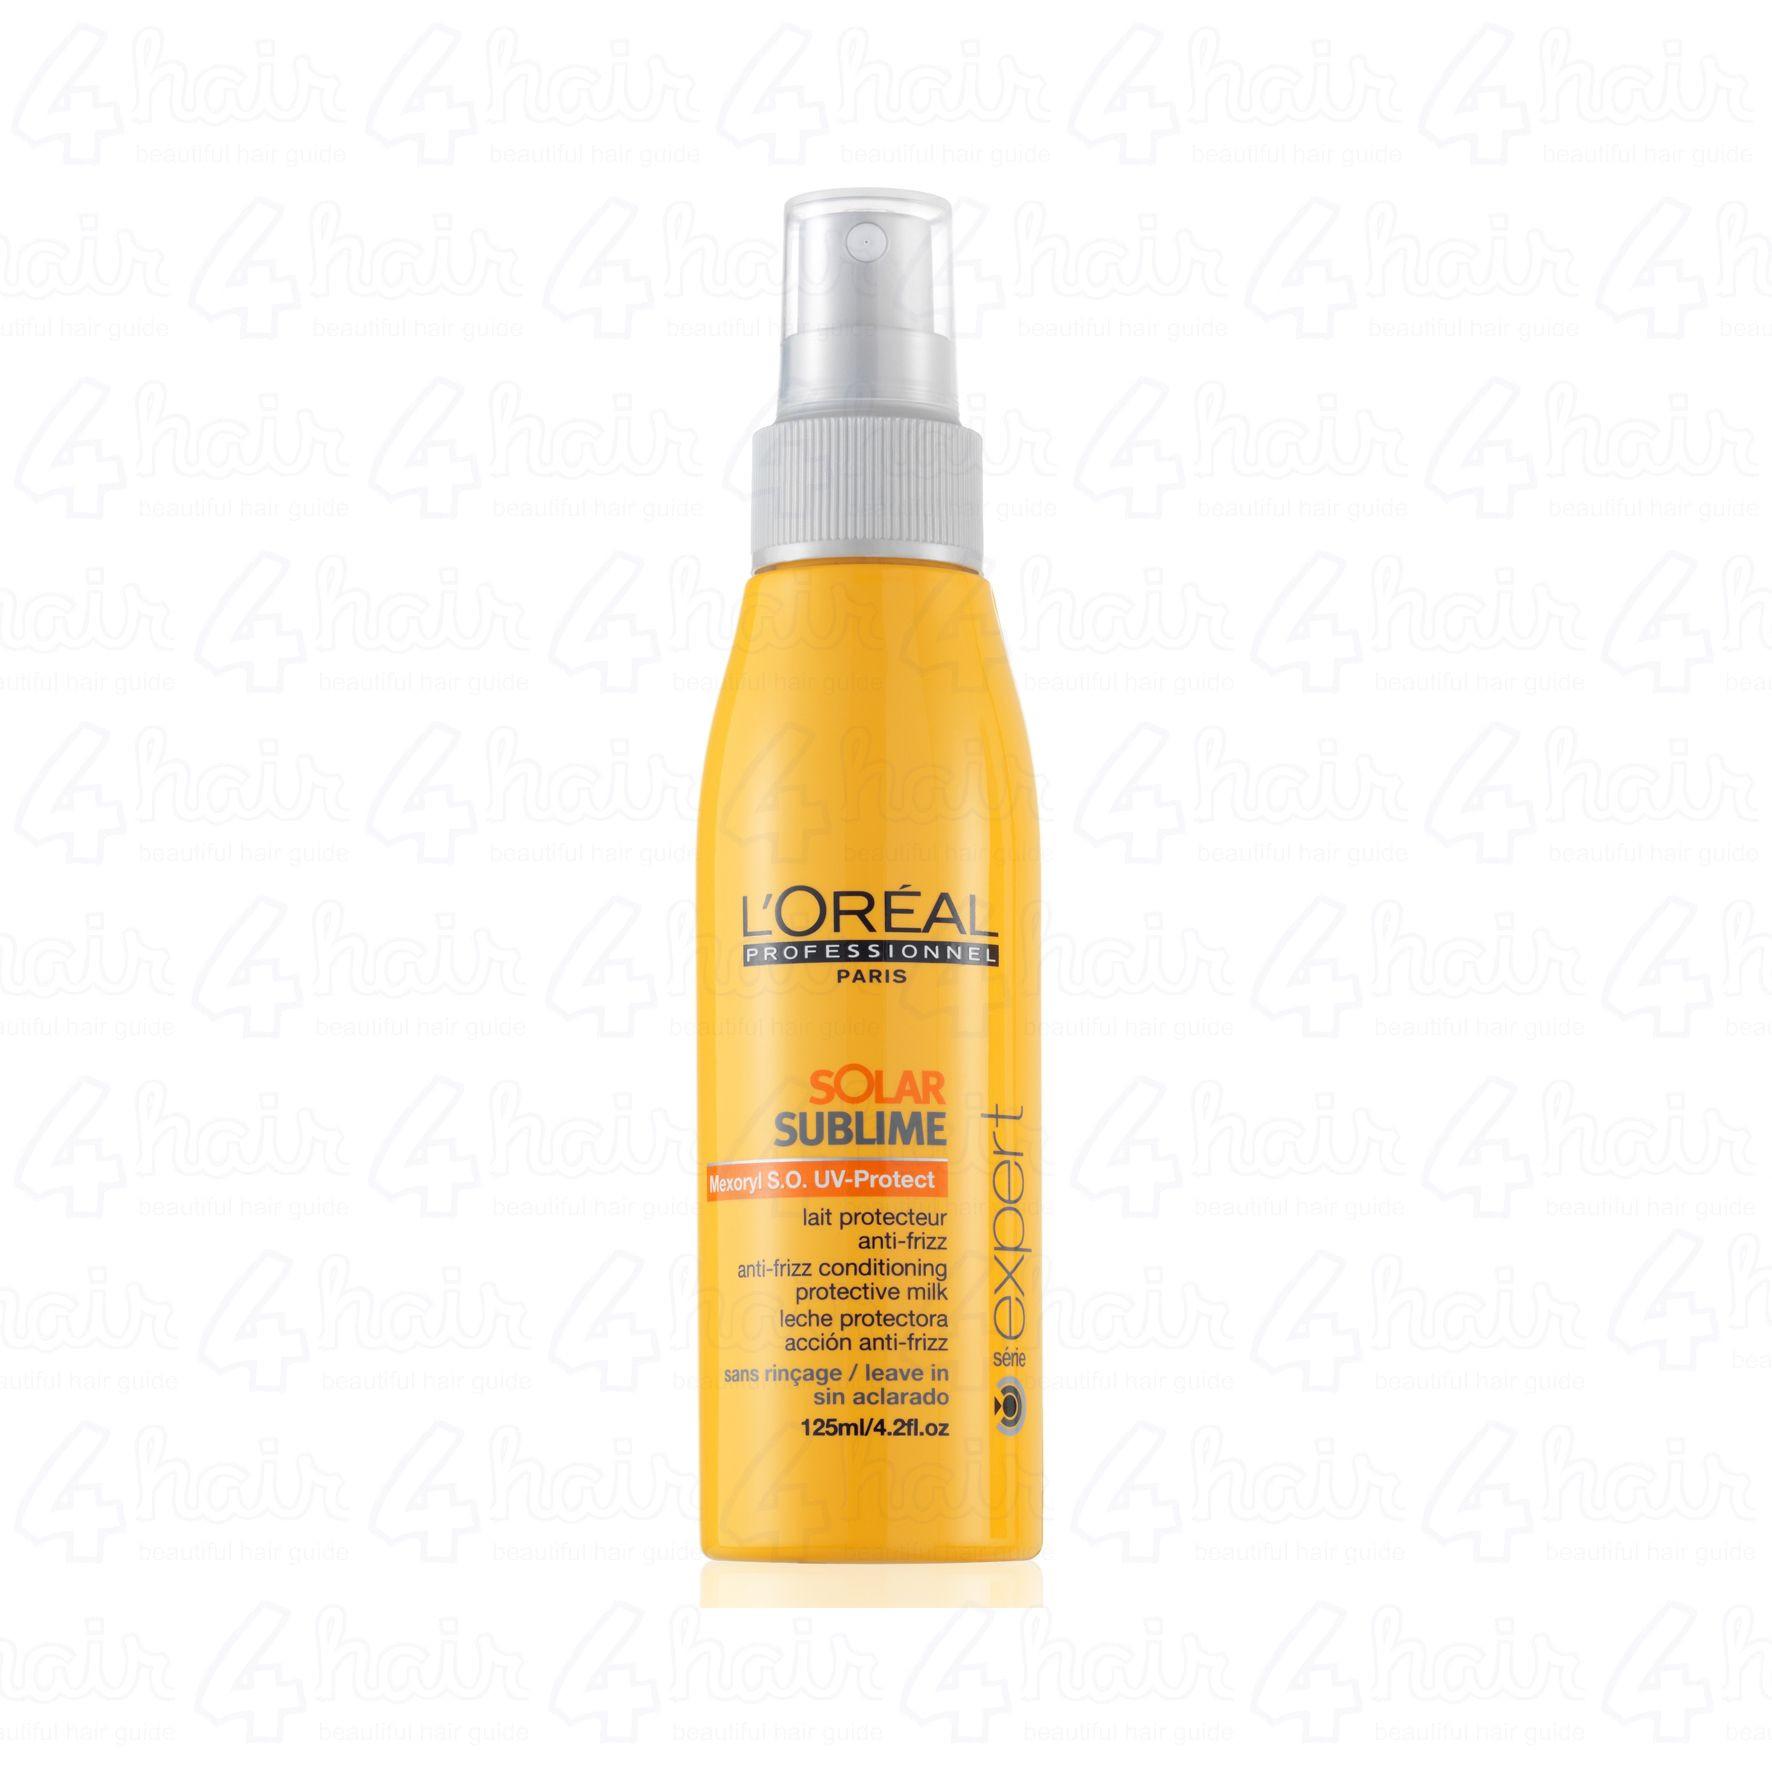 L Oreal Professionnel Solar Sublime Mexoryl S O Uv Protect